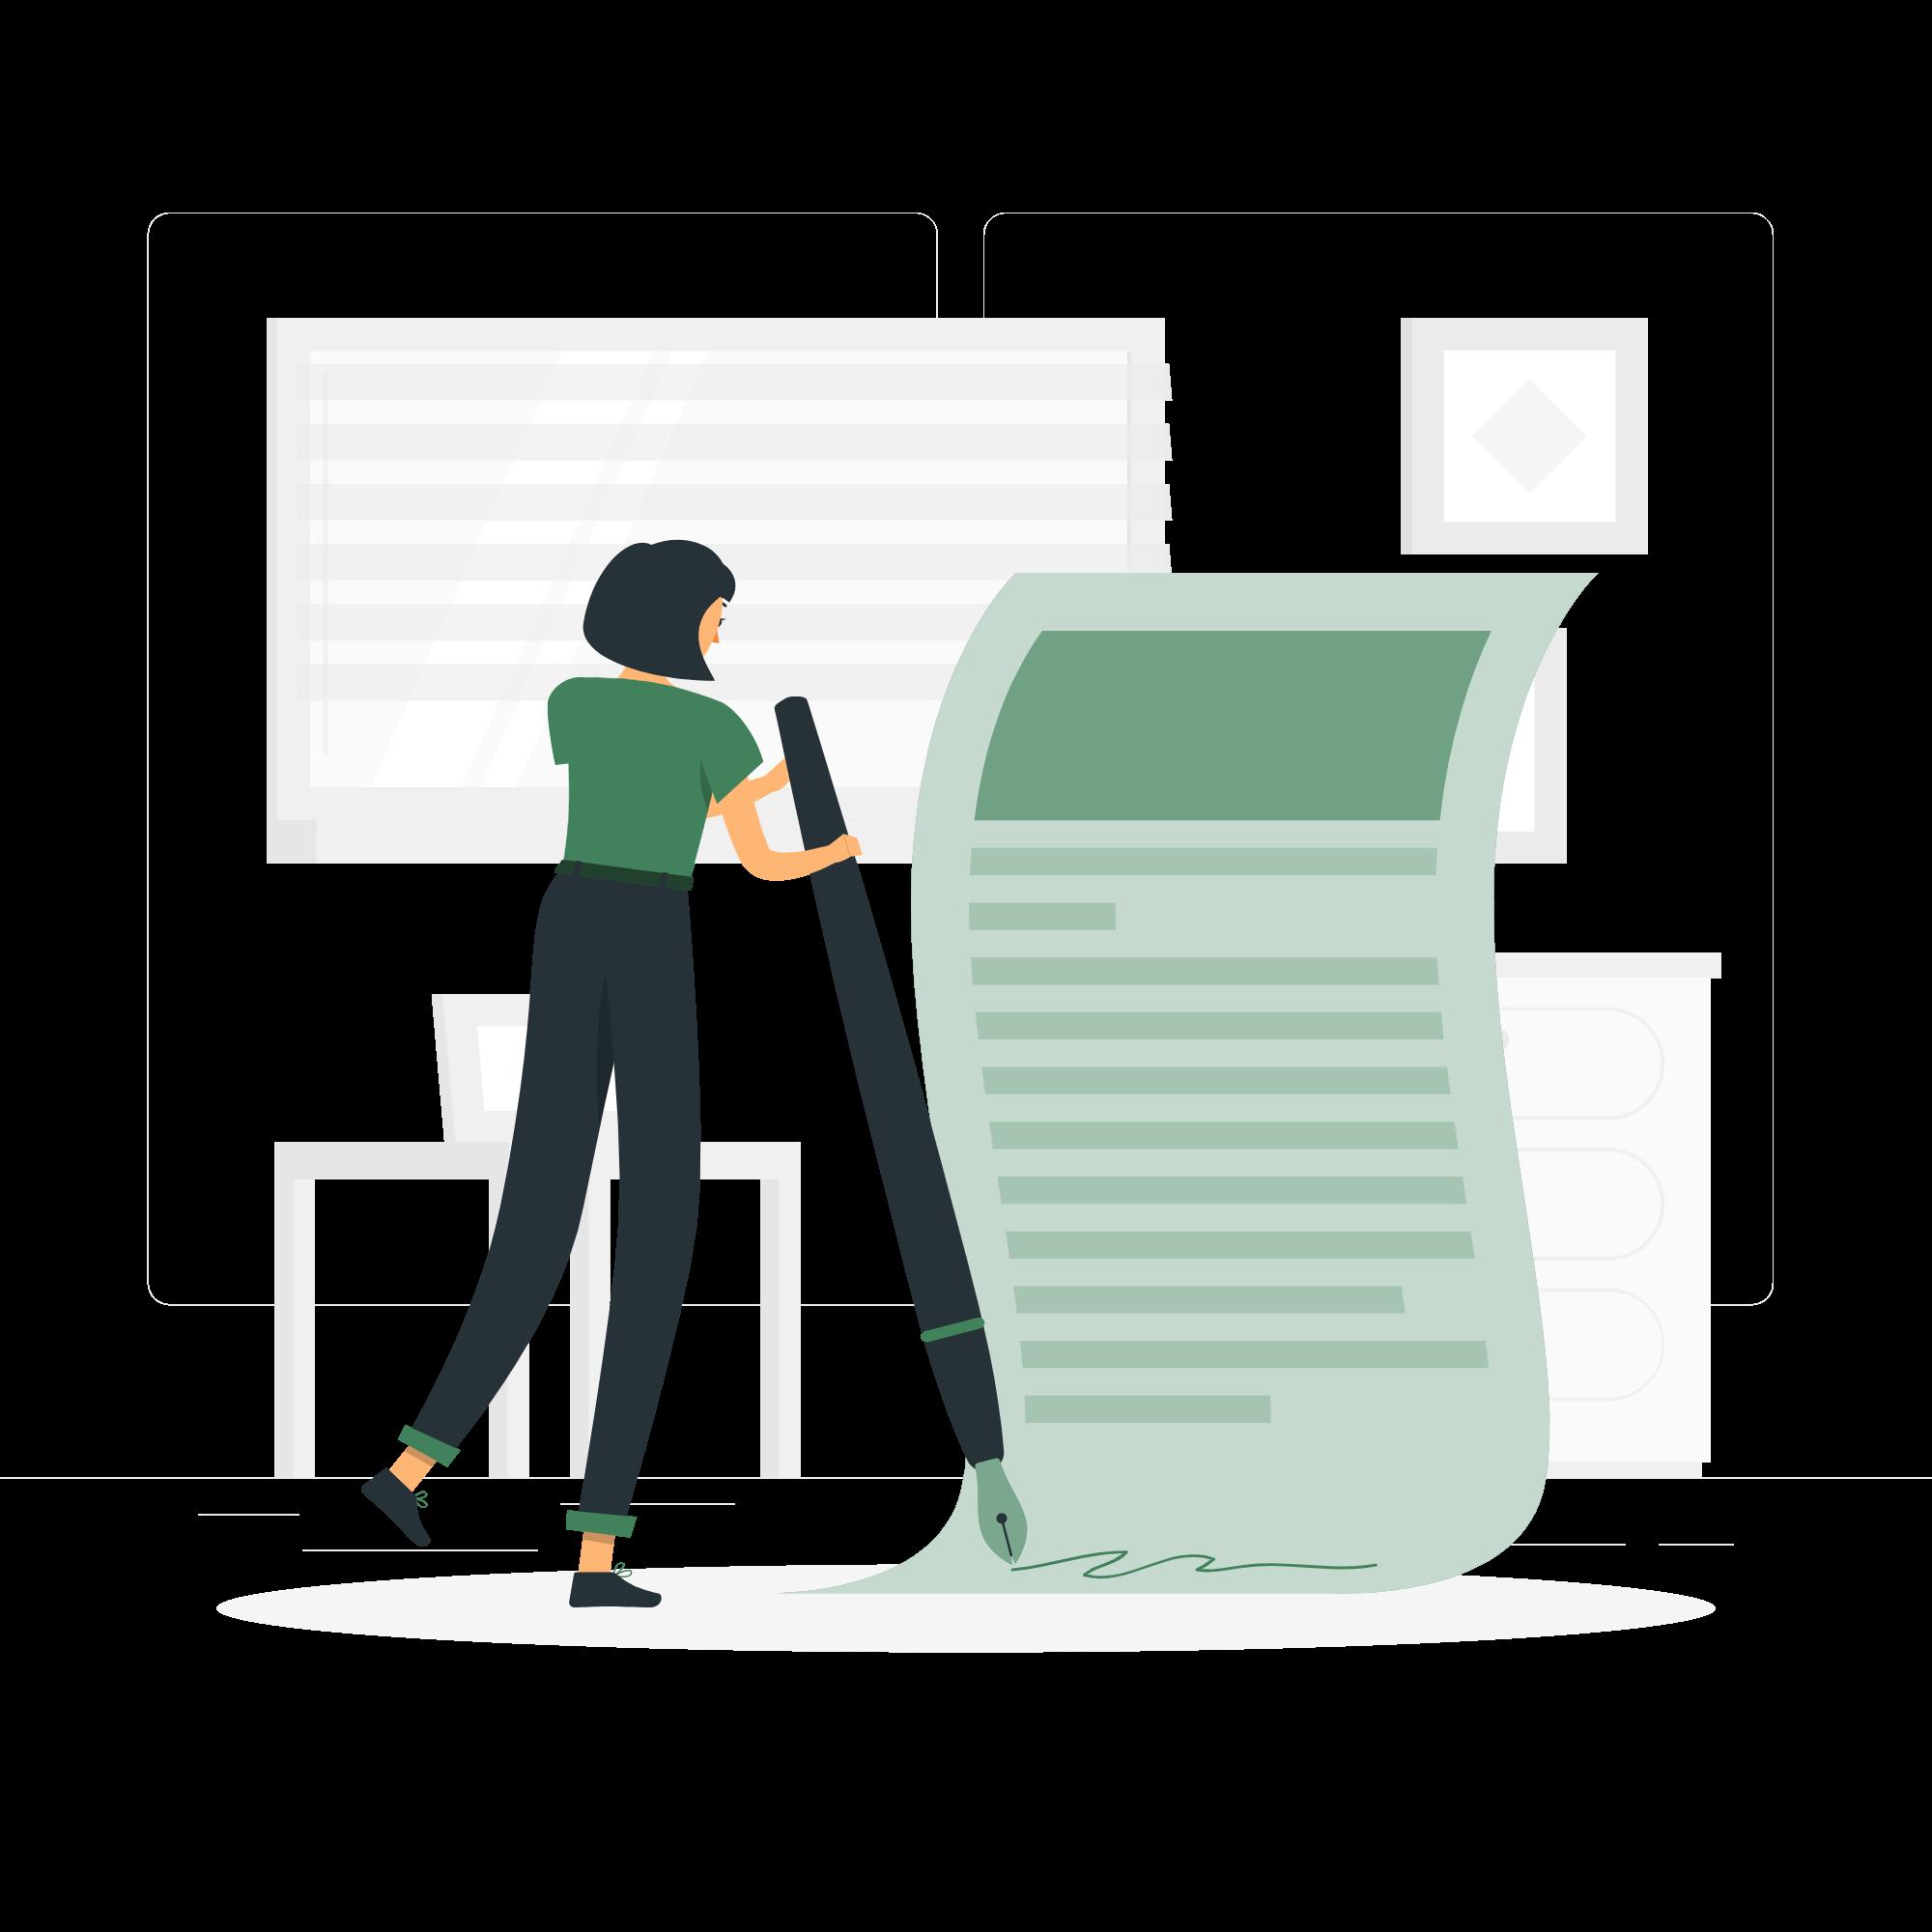 "<a href=""https://storyset.com/business"">Illustration by Freepik Storyset</a>"